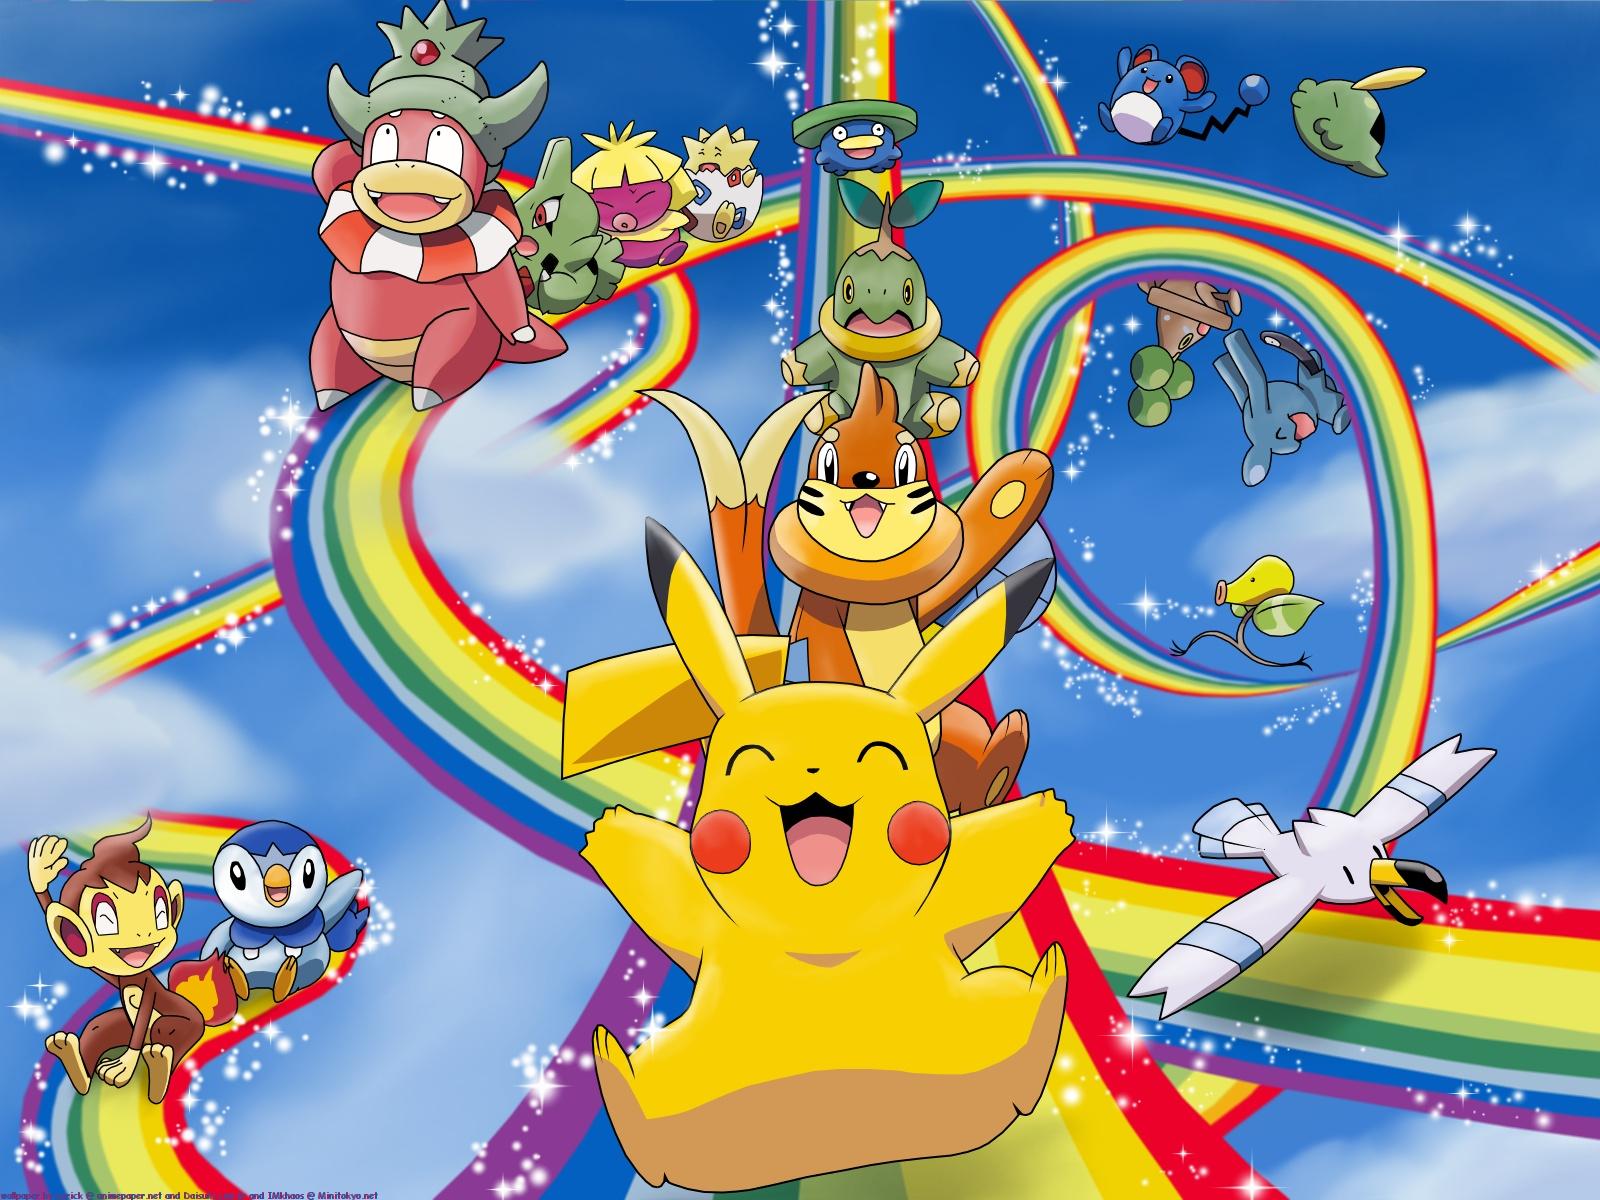 Pikachu-Wallpaper-pikachu-24422947-1600-1200.jpg